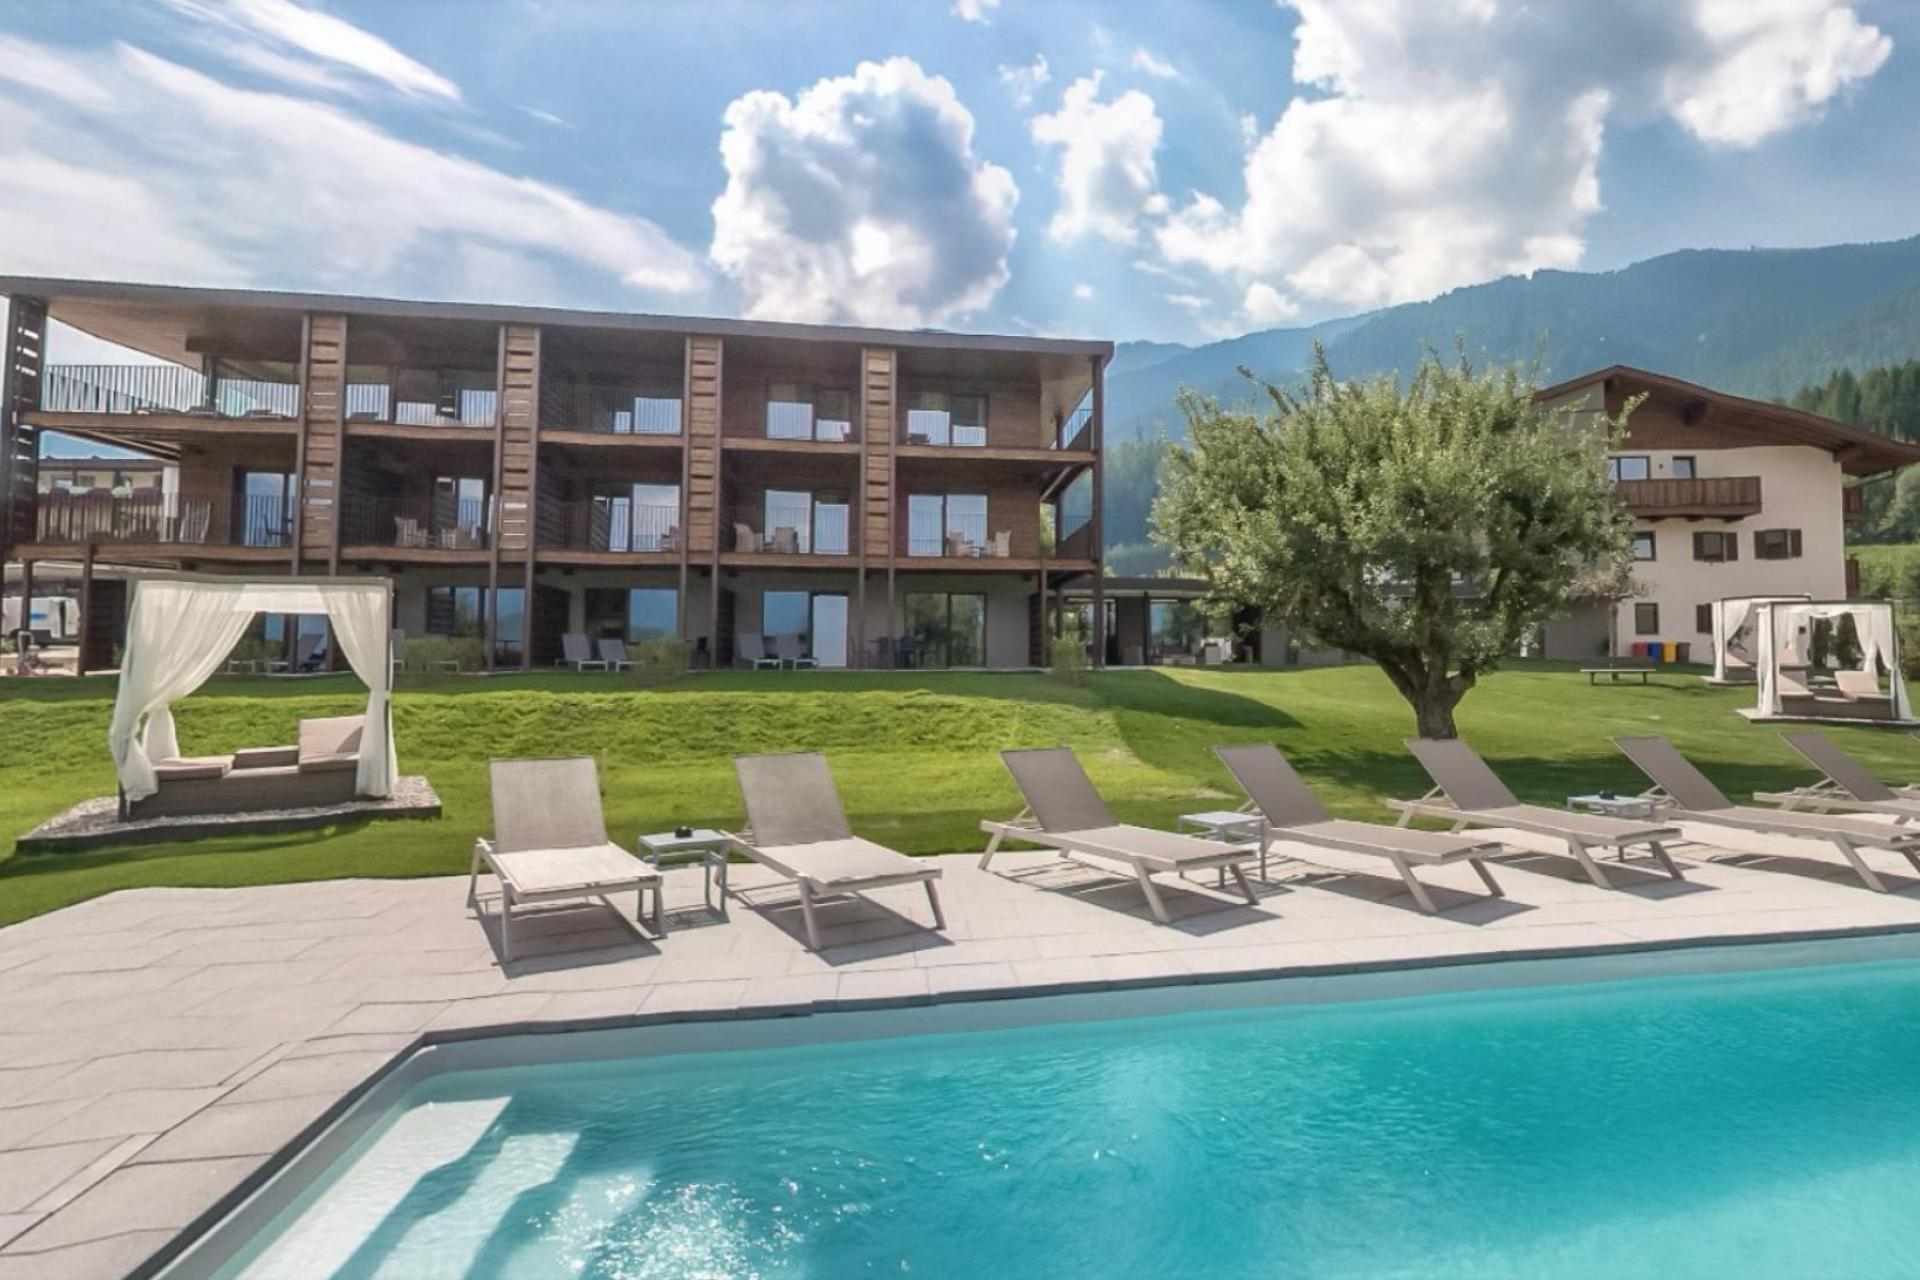 Agriturismo Dolomieten Residence Dolomieten op loopafstand van dorp en skilift